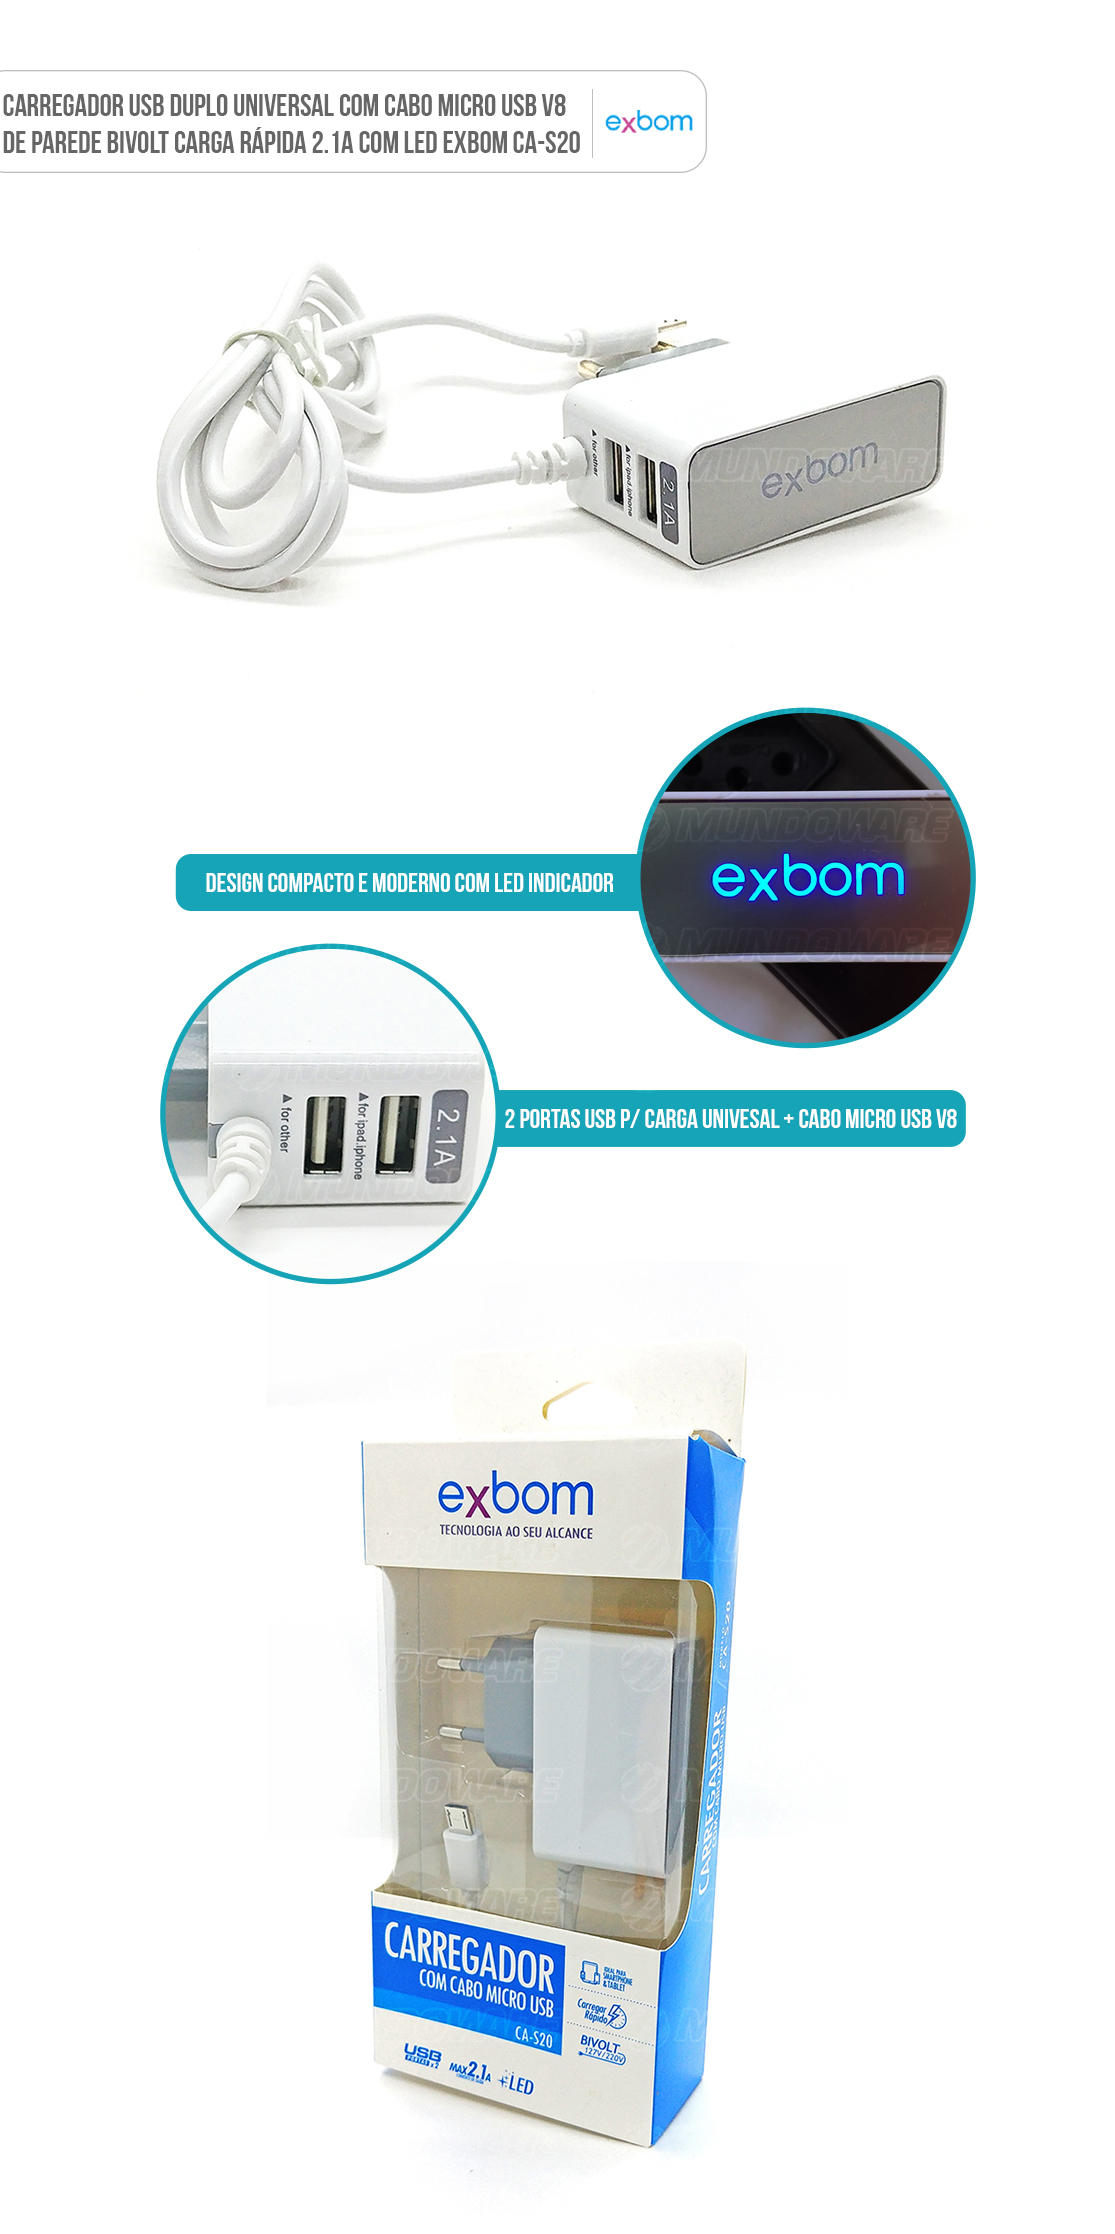 Carregador para Celular de Parede 2 Portas USB Carga Rápida Universal